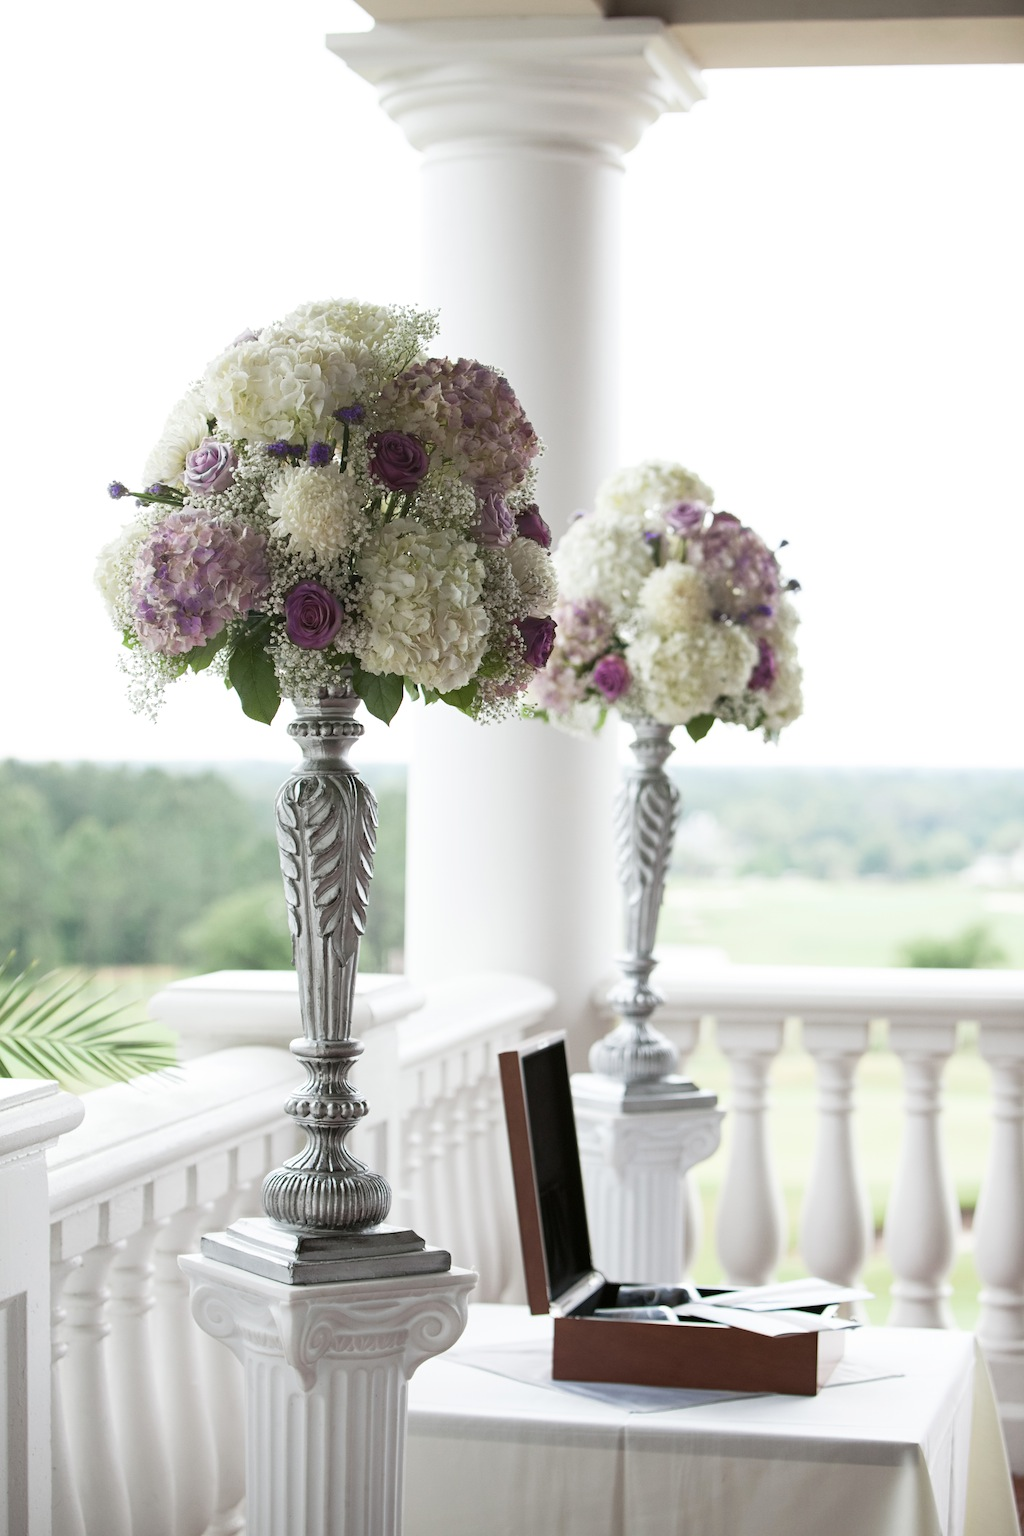 Brooksville Wedding - Purple, Silver & Ivory Wedding at Southern Hills Plantation Club - Brooksville Wedding Photographer Blue Lane Studios (28)